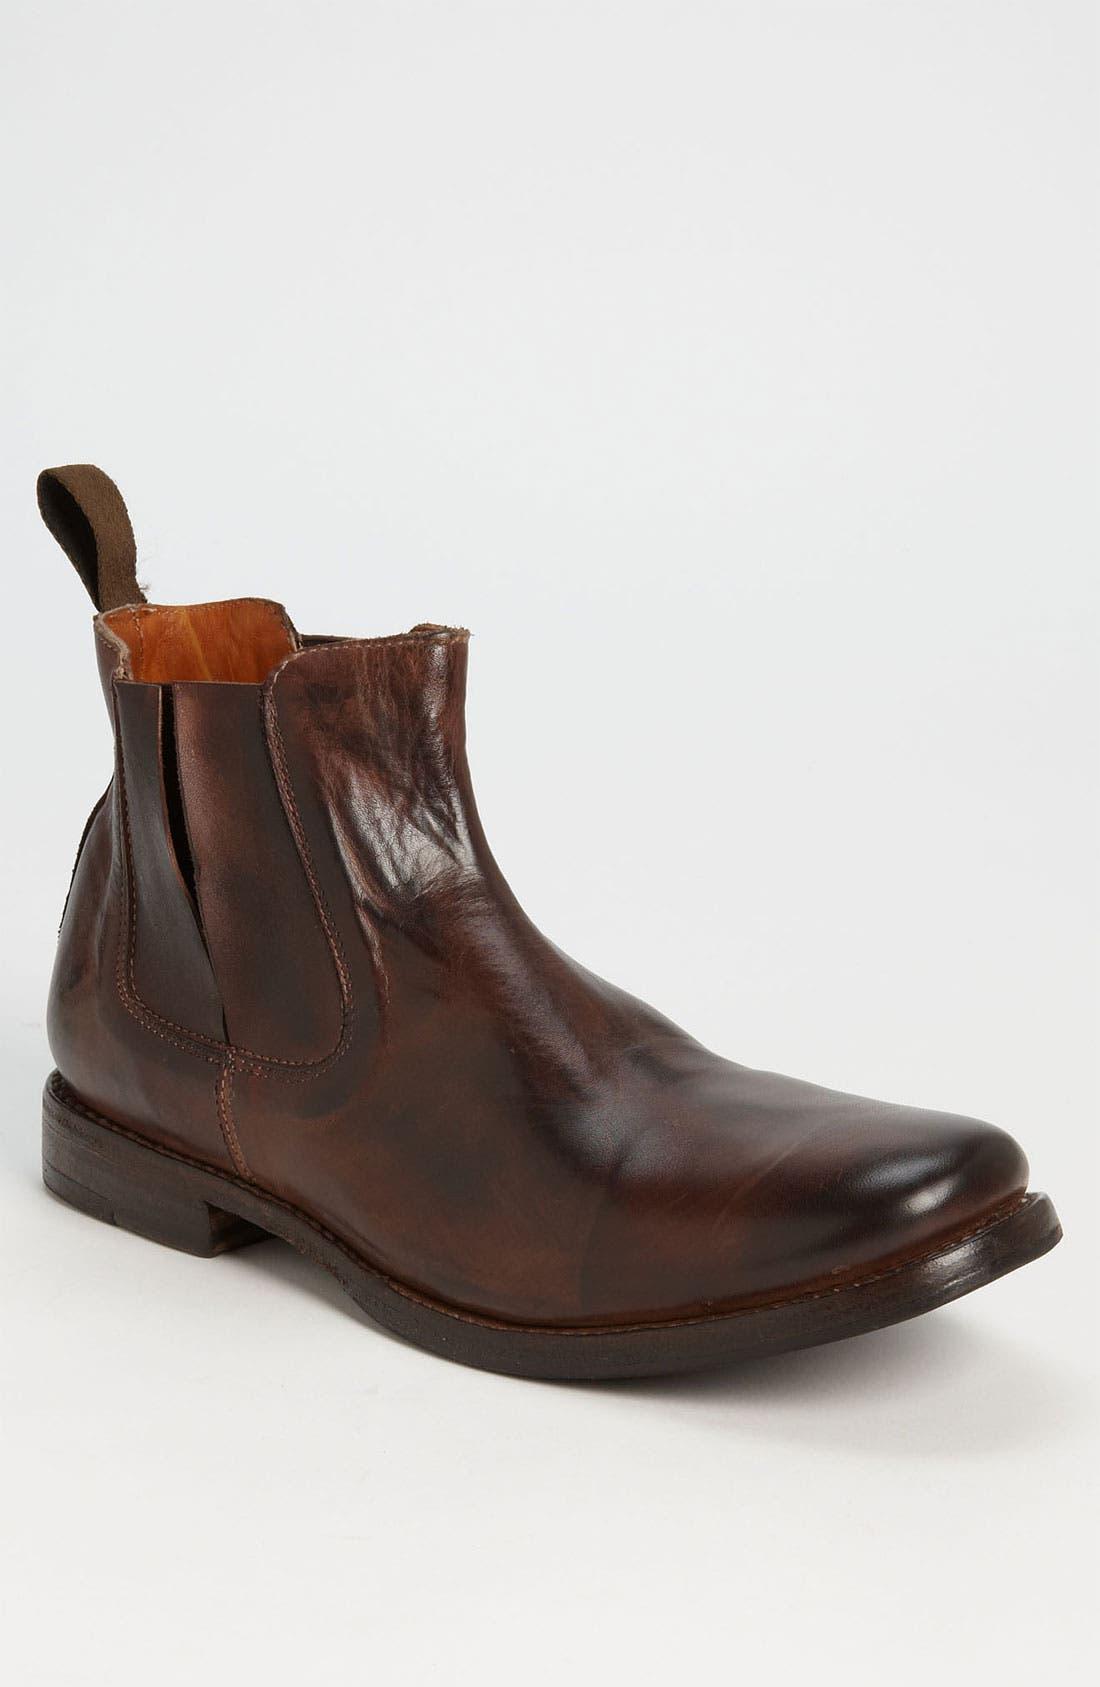 Main Image - Bed Stu 'Taurus II' Chelsea Boot